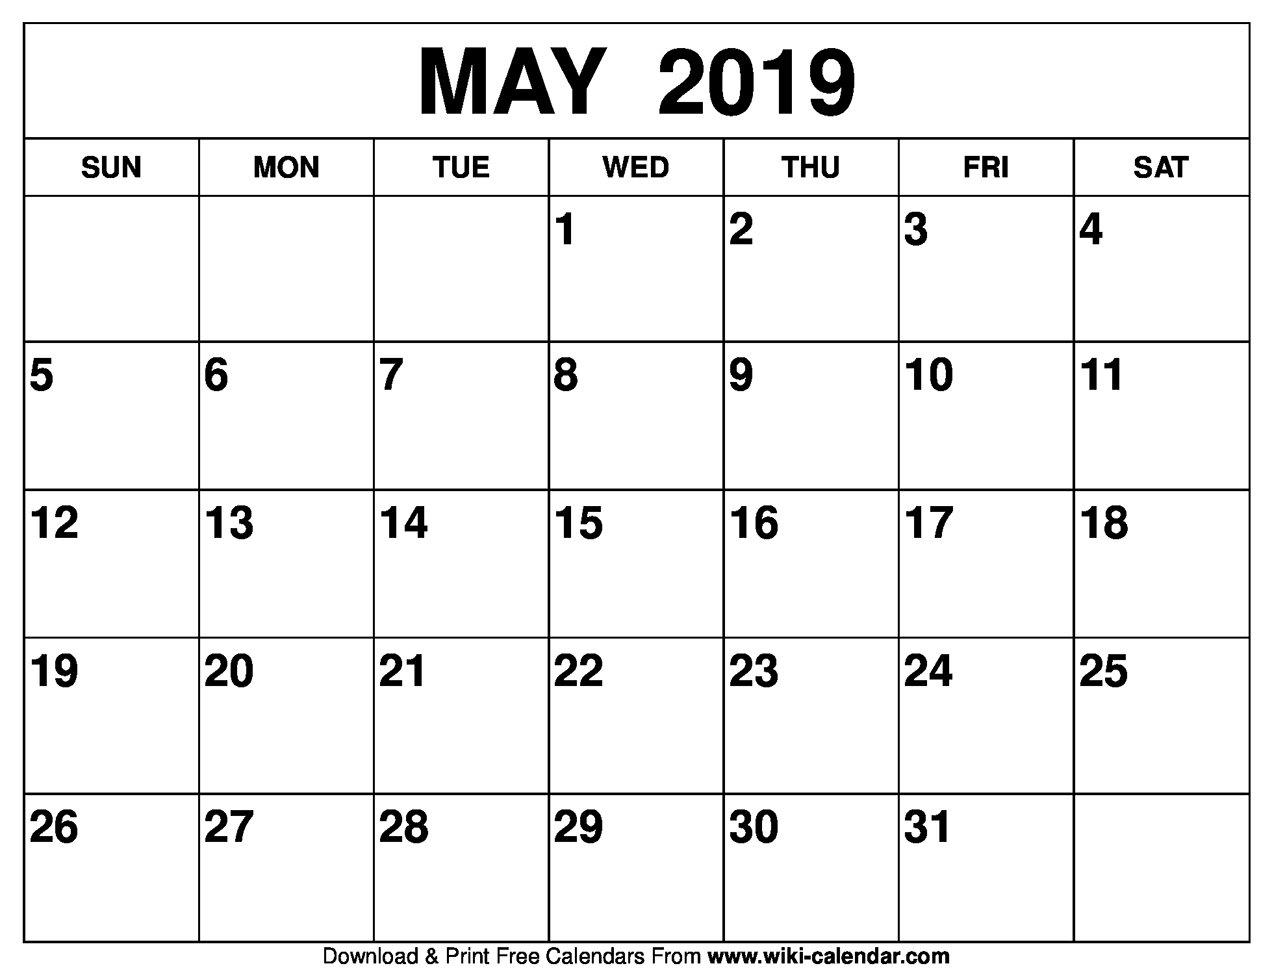 Blank May 2019 Calendar Printable May 3 2019 Calendar